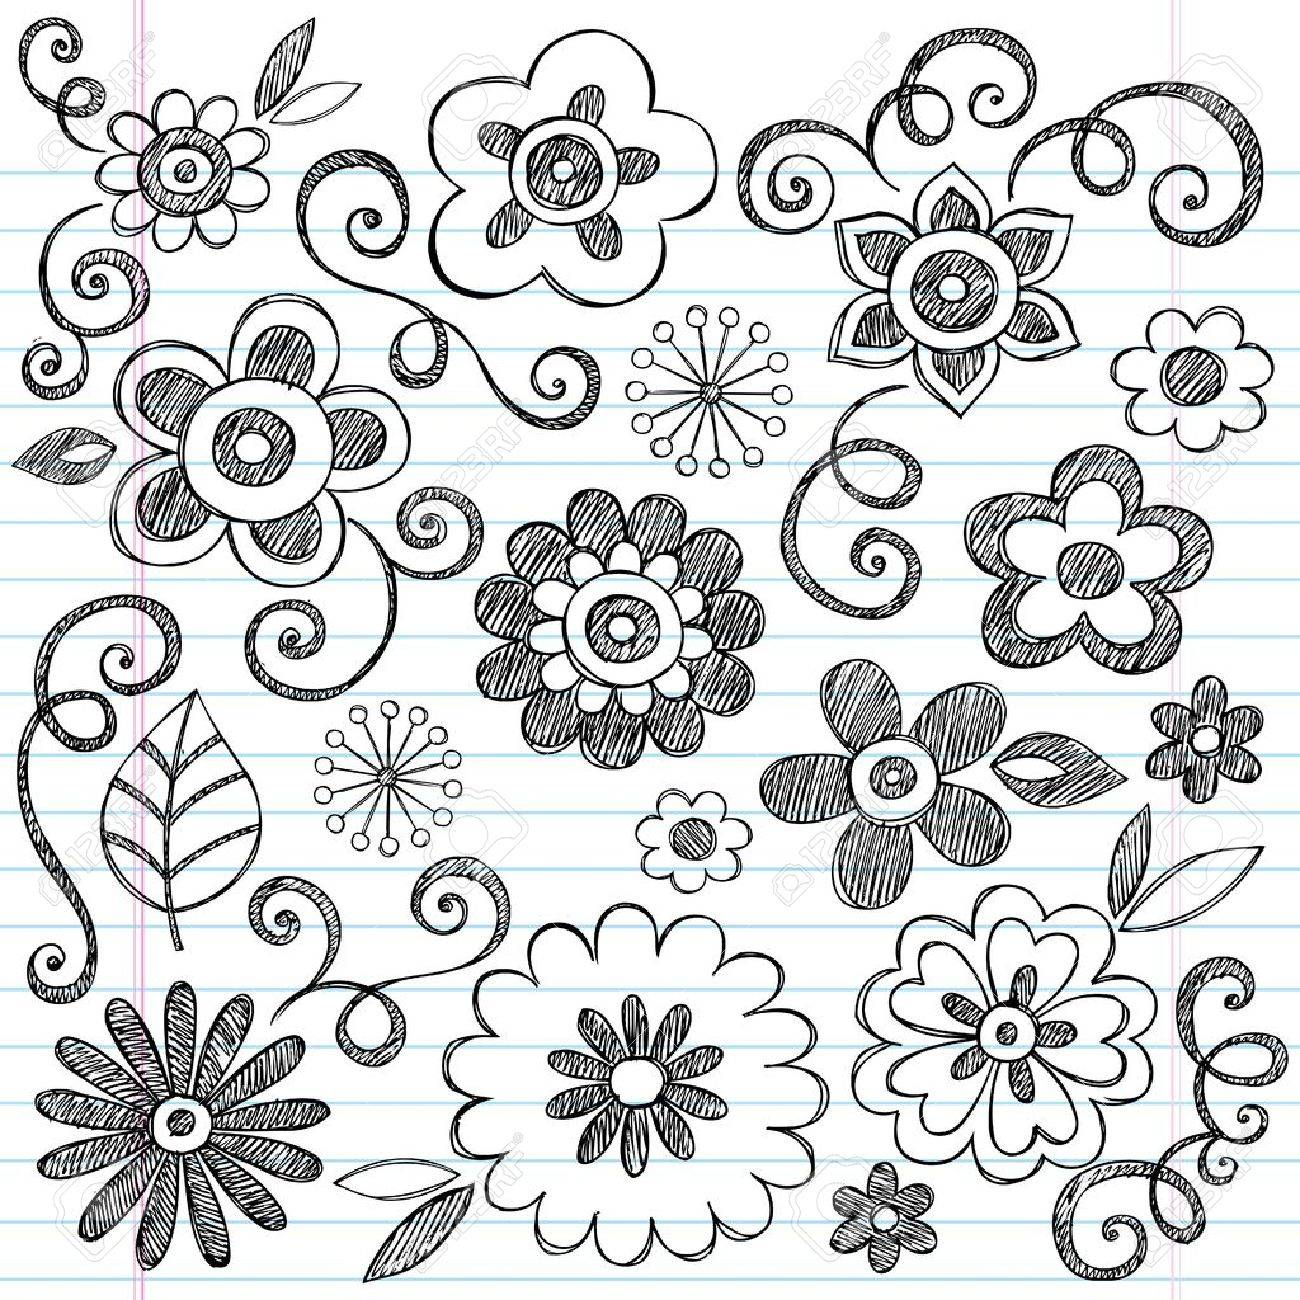 Flowers Sketchy Doodles Hand-Drawn Back to School Notebook Vector Illustration Design Elements on Lined Sketchbook Paper Background Stock Vector - 12496341